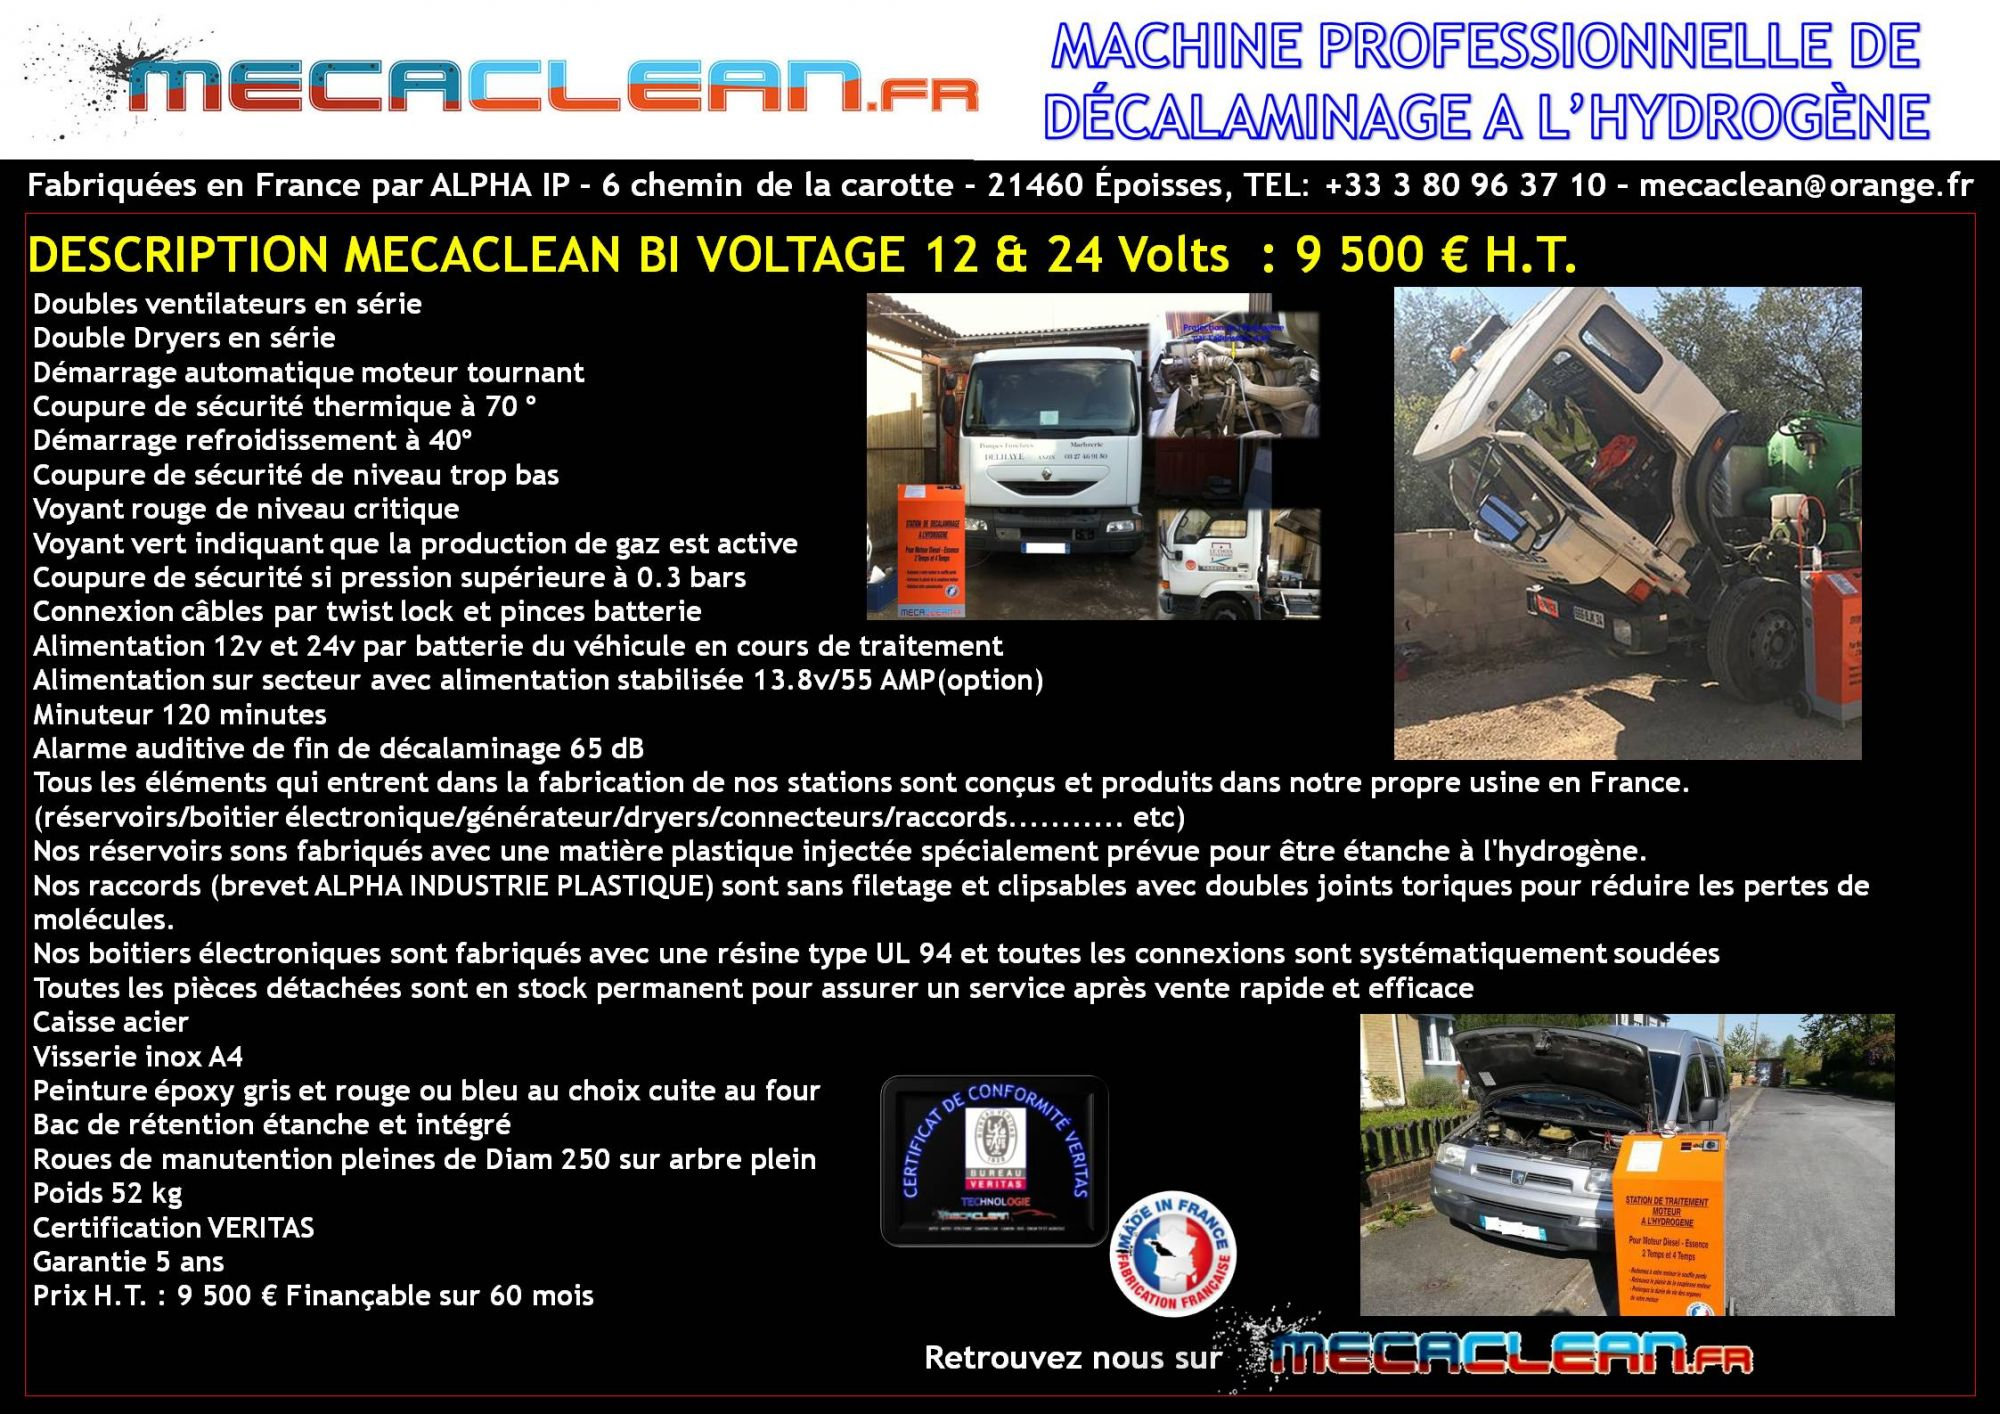 distributeur-mecaclean-5-jpeg